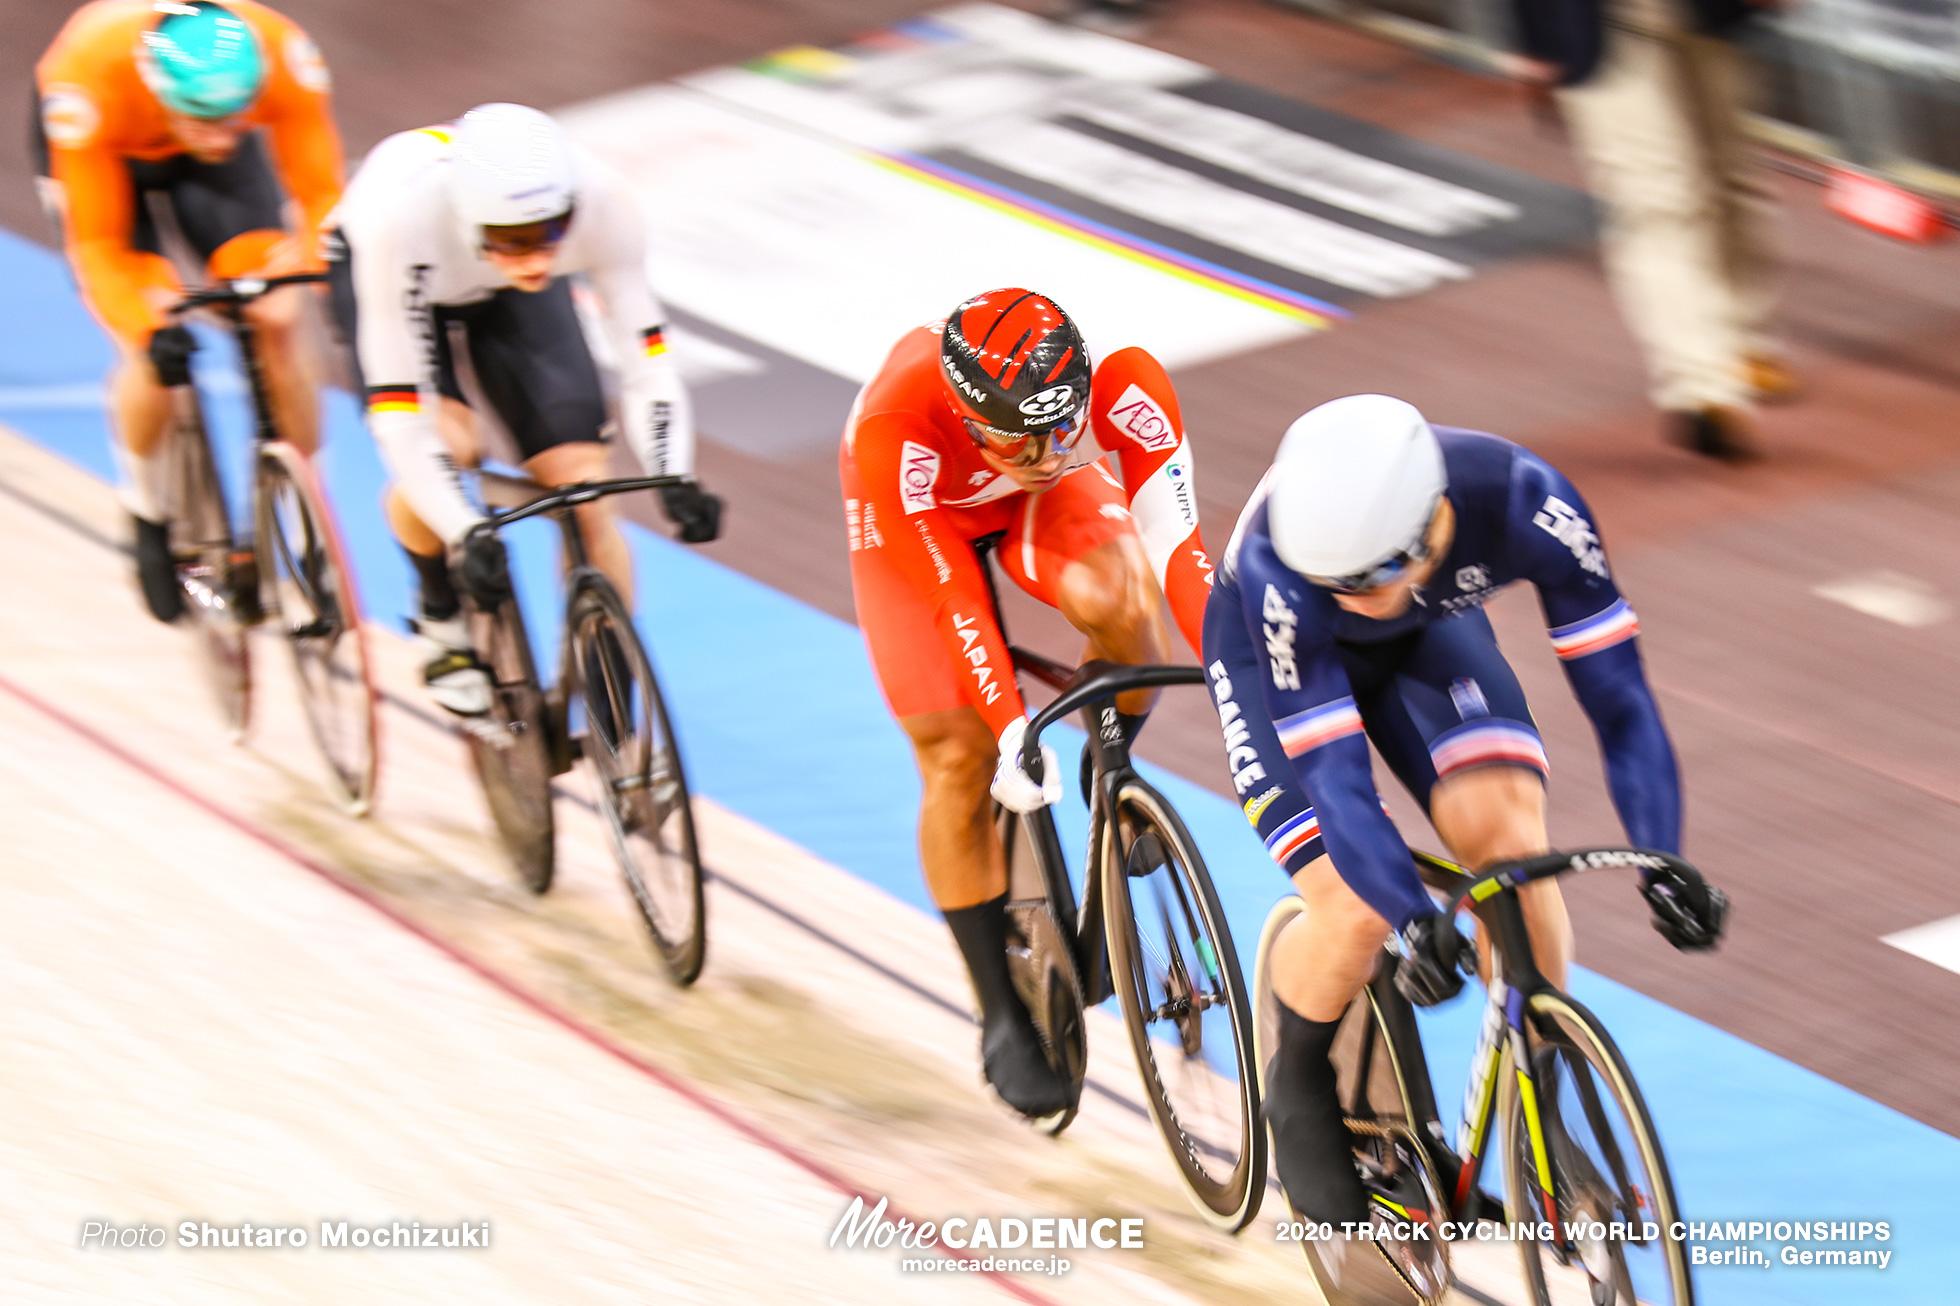 Semi Final / Men's Keirin / 2020 Track Cycling World Championships